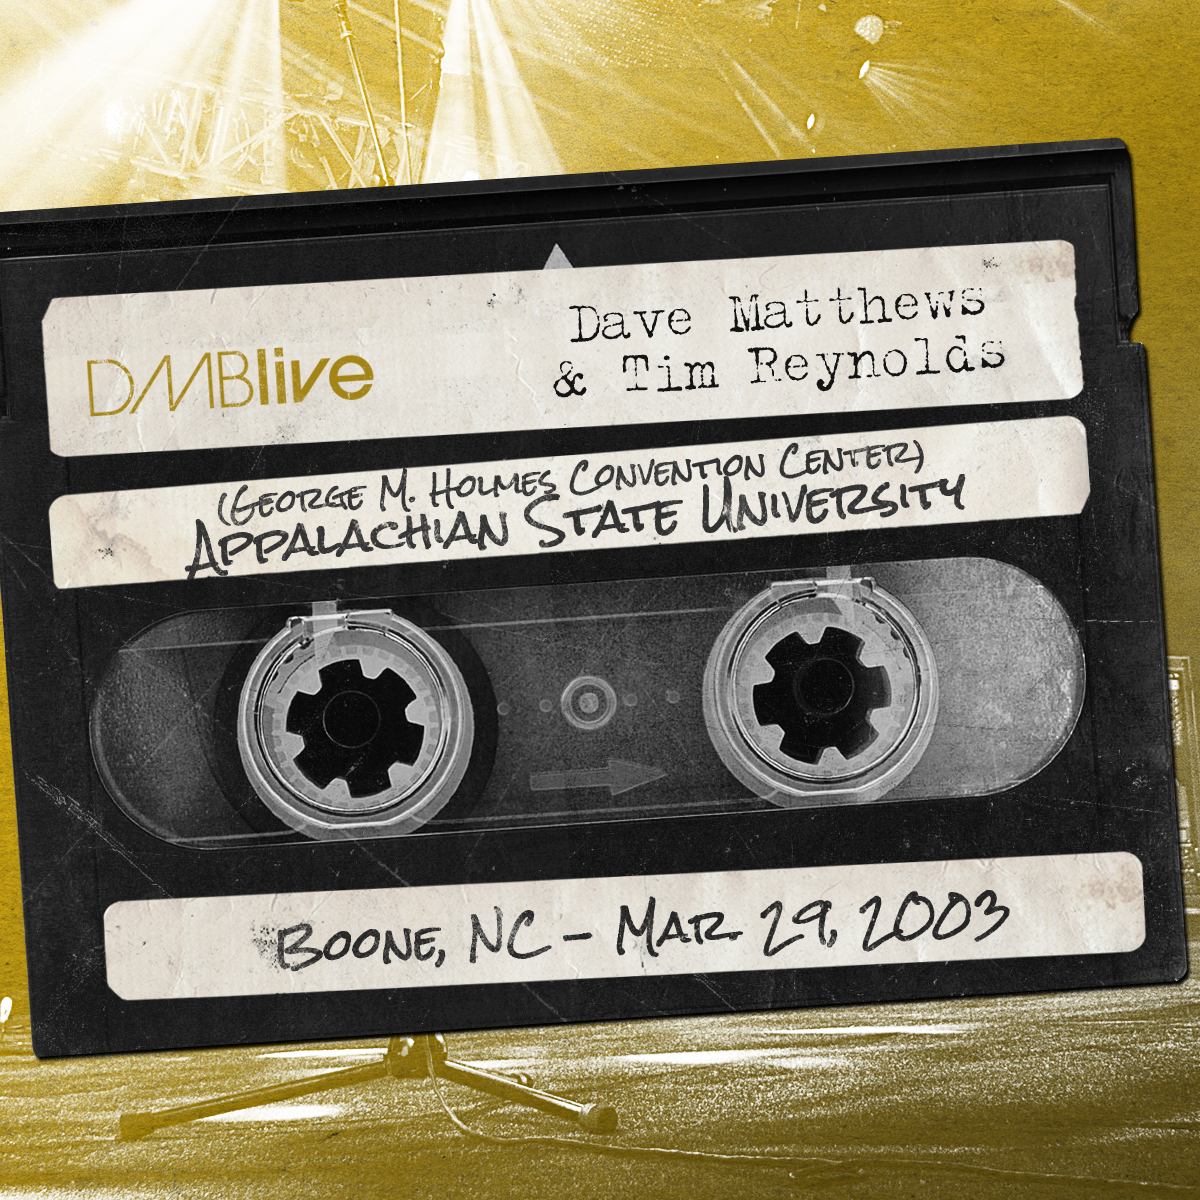 Dave Matthews & Tim Reynolds Appalachian State University, Boone, NC 3/29/2003